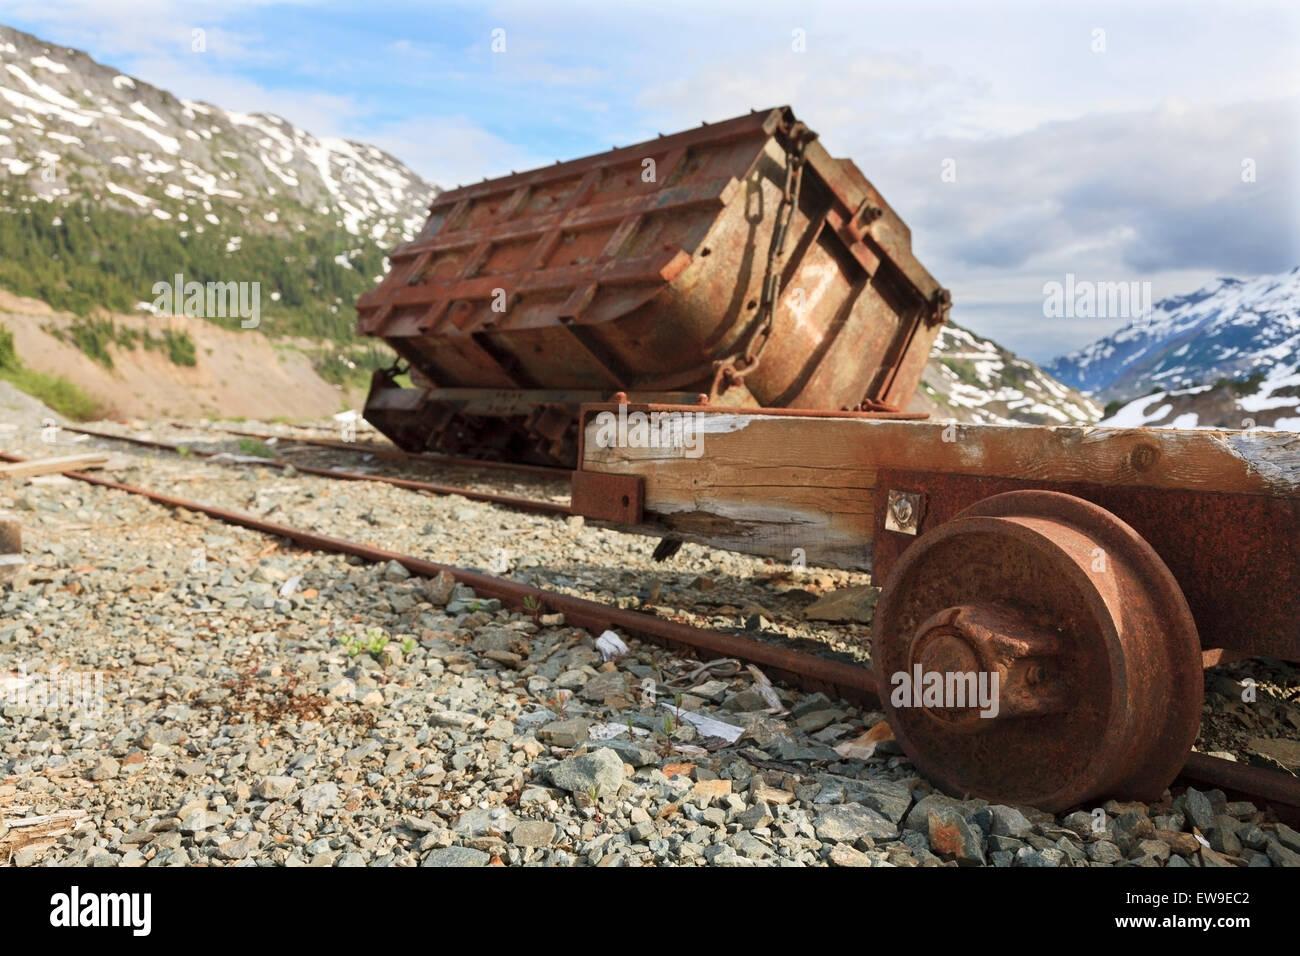 Old underground mining ore cart near the old mine site of Granduc, Stewart area, British Columbia - Stock Image